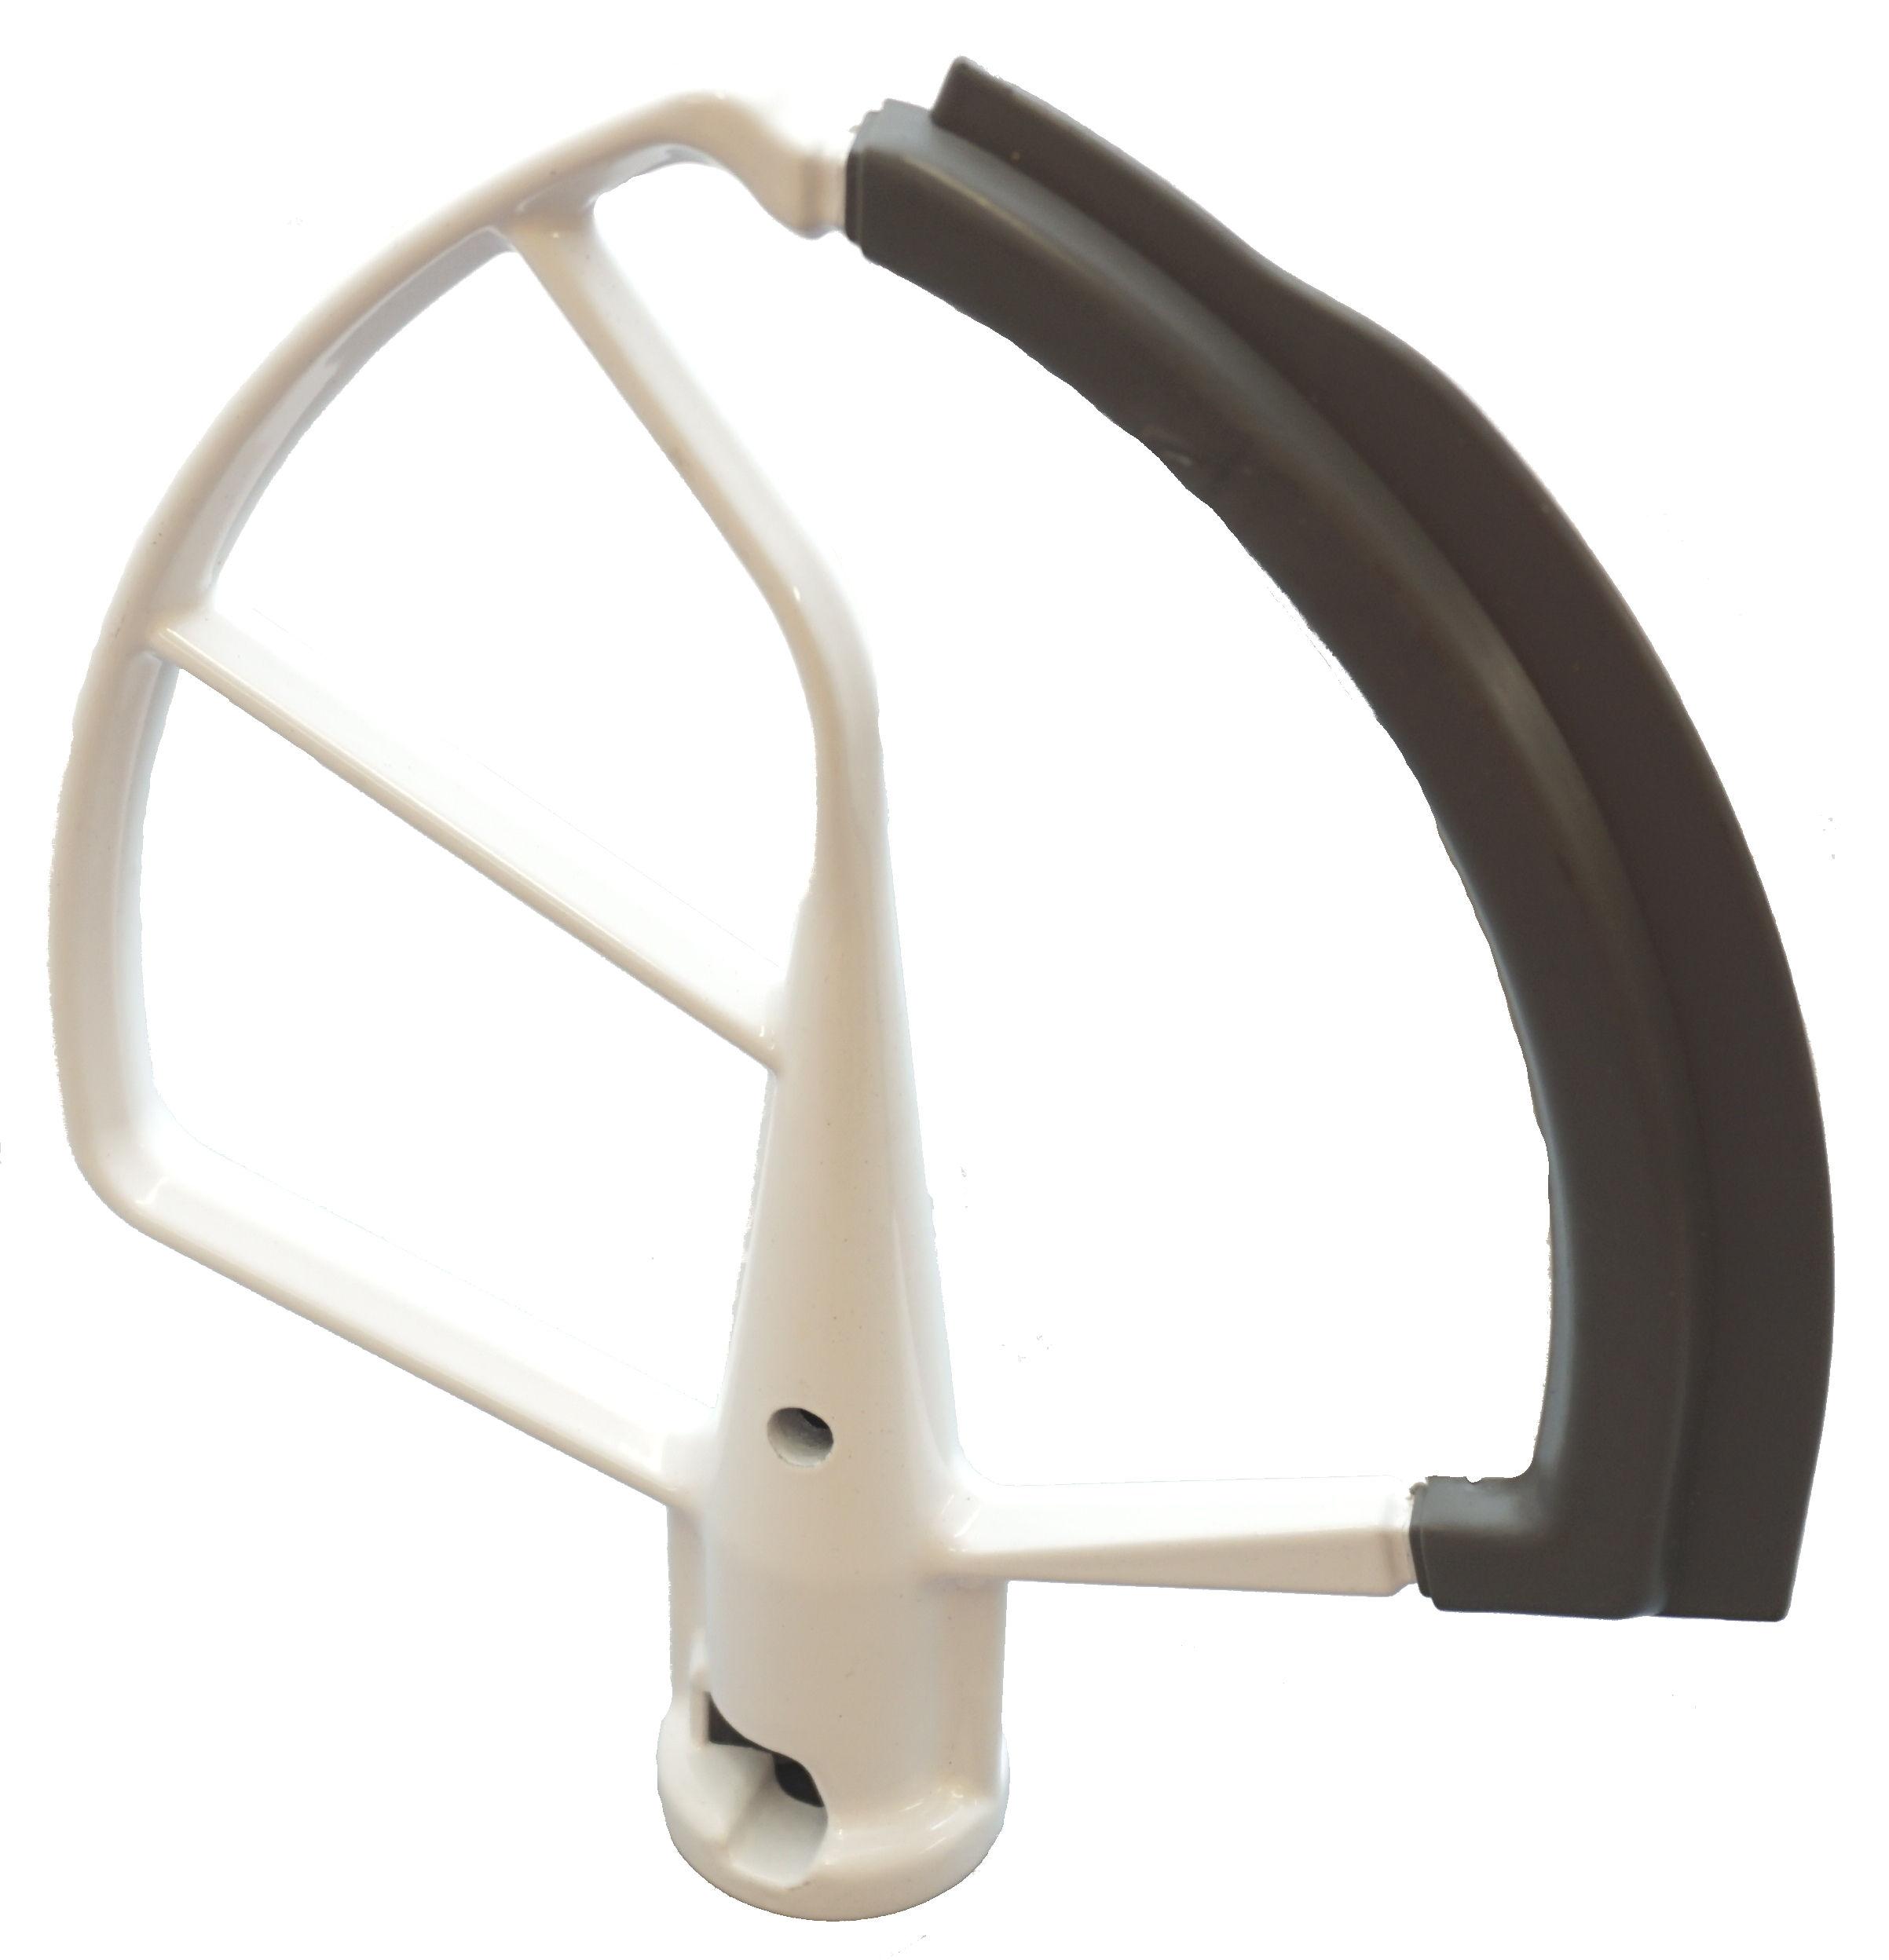 5.5 Qt & 6 Qt Tilt-Head Flex Edge Beater for Kitchenaid Stand Mixer, SRTKFE6L